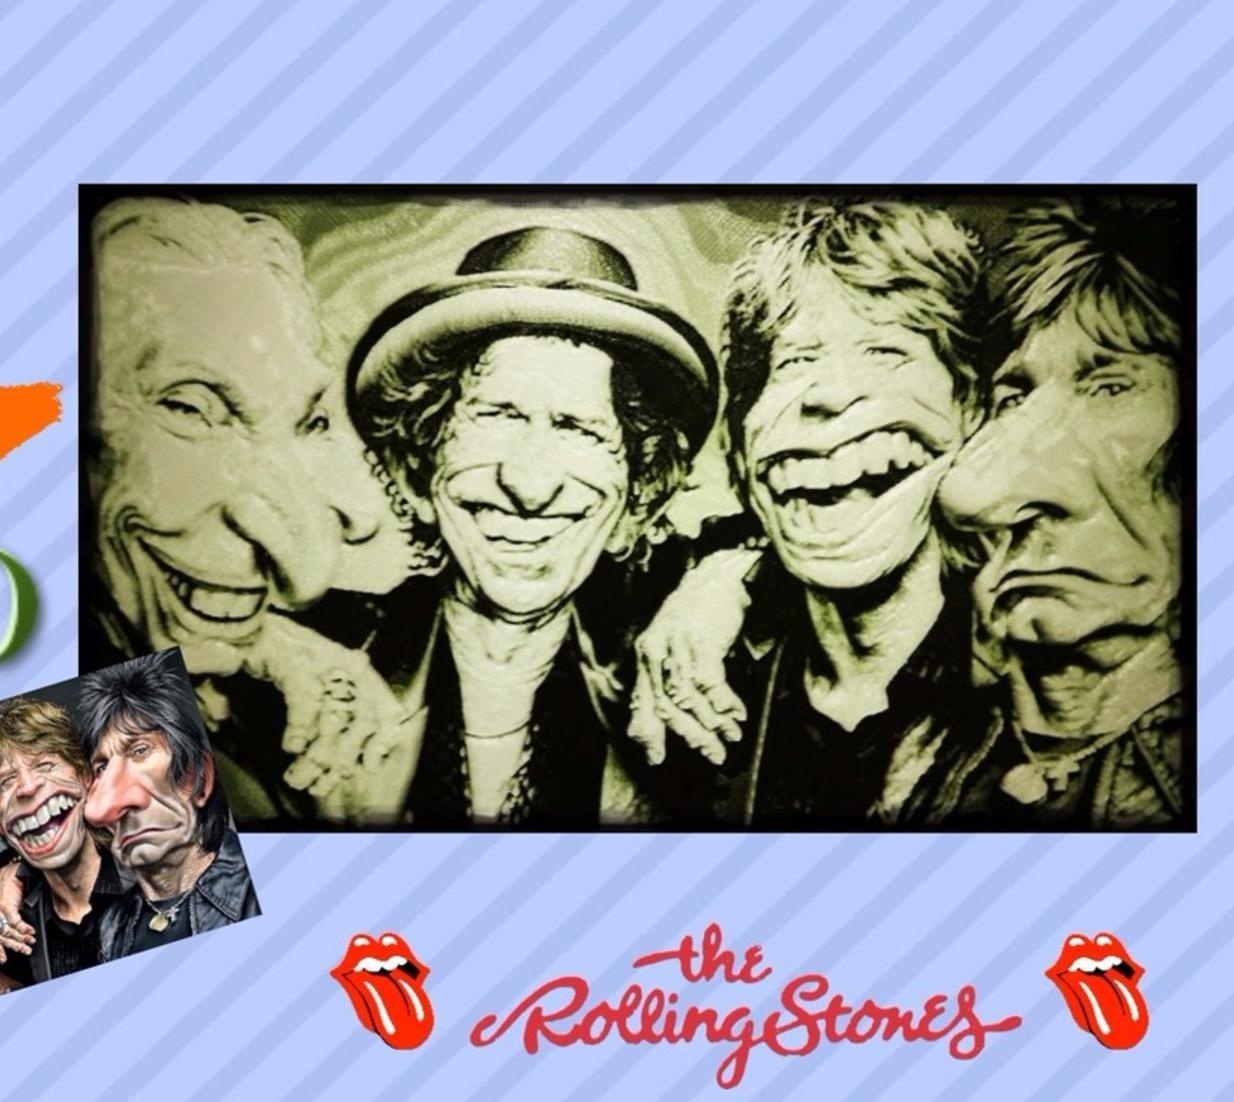 Capture d'écran 2017-09-05 à 17.29.03.png Download free STL file The Rollings Stones drawing 3D • 3D printing model, 3dlito